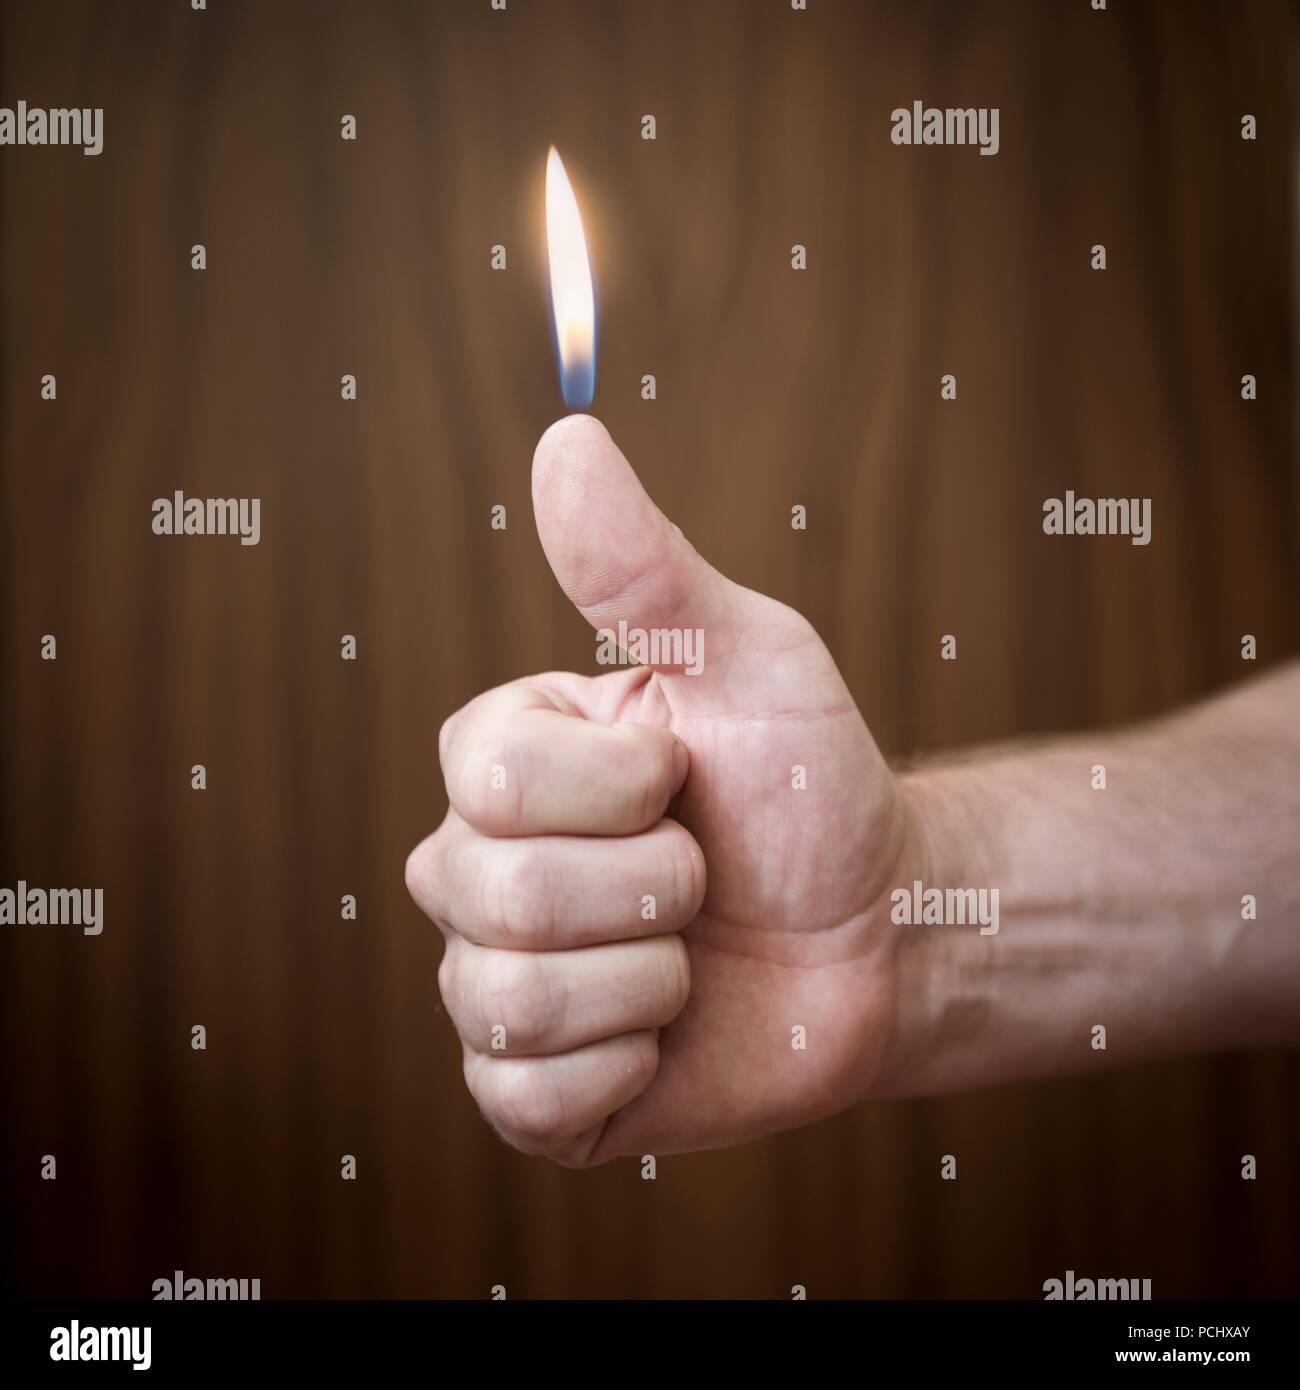 Ideen, Flame, menschlichen Daumen, Wick, Brennen Stockbild